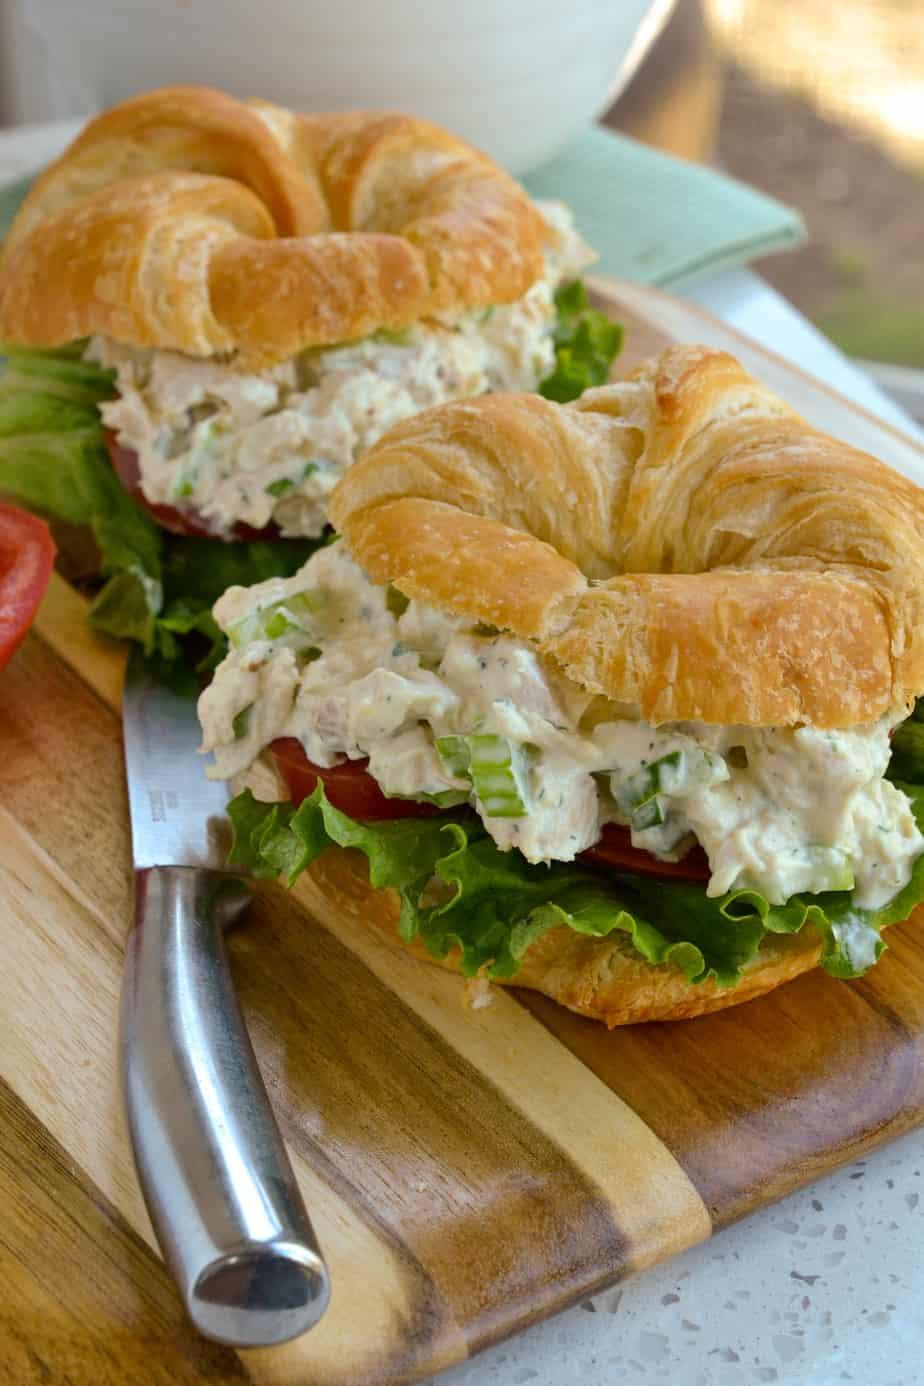 Creamy chicken salad on a croissant.